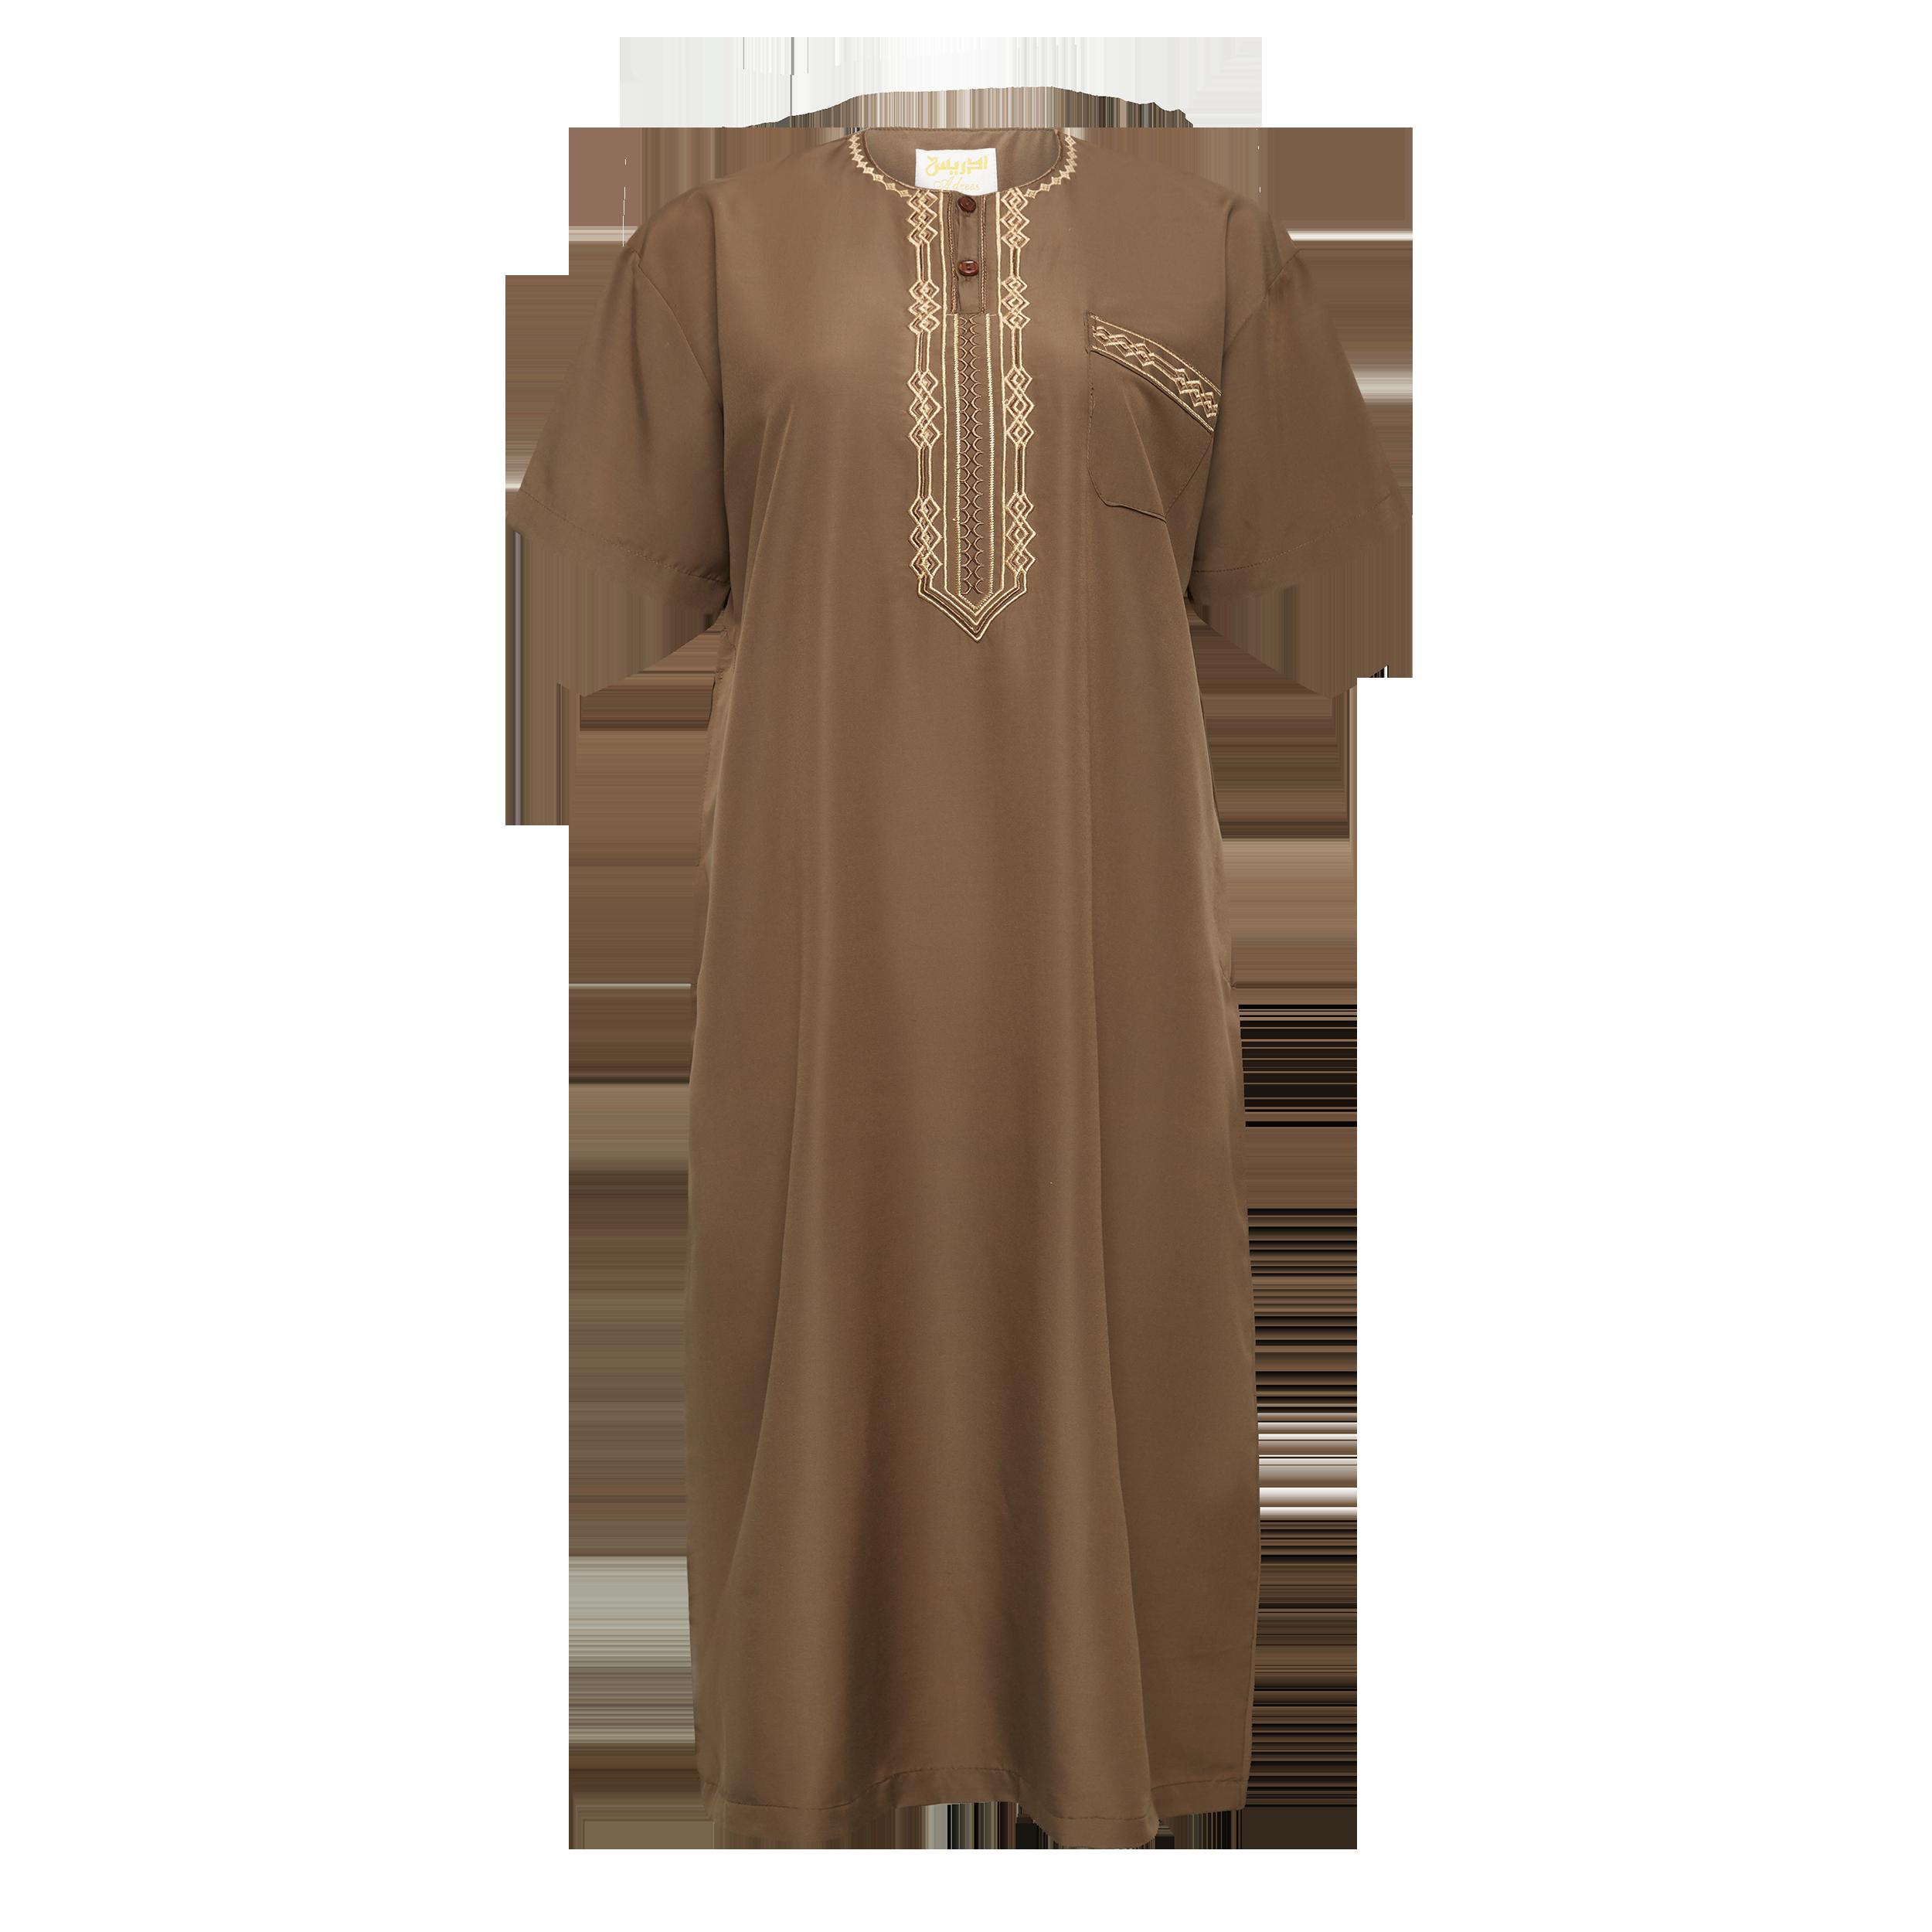 dubai islamic clothing For BOY Jalabiya arab thobe for boy